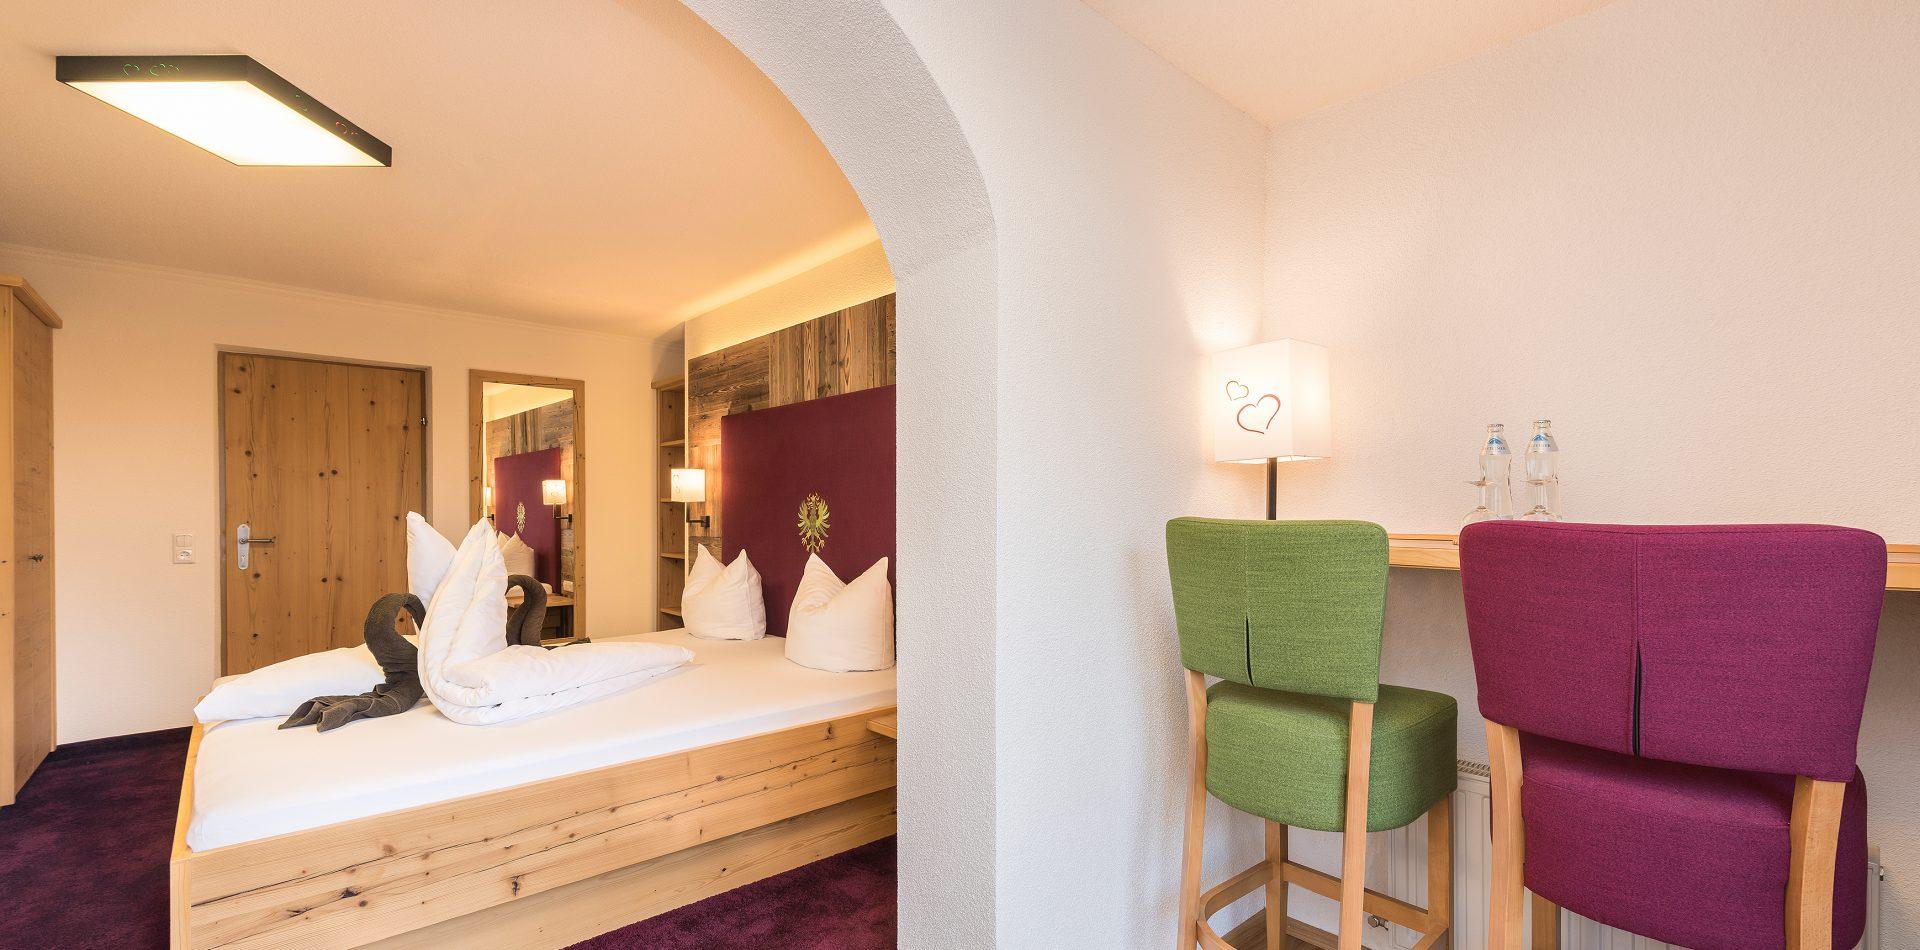 Doppelzimmer im ERIKA, dem LifeStyle Hotel Neustift